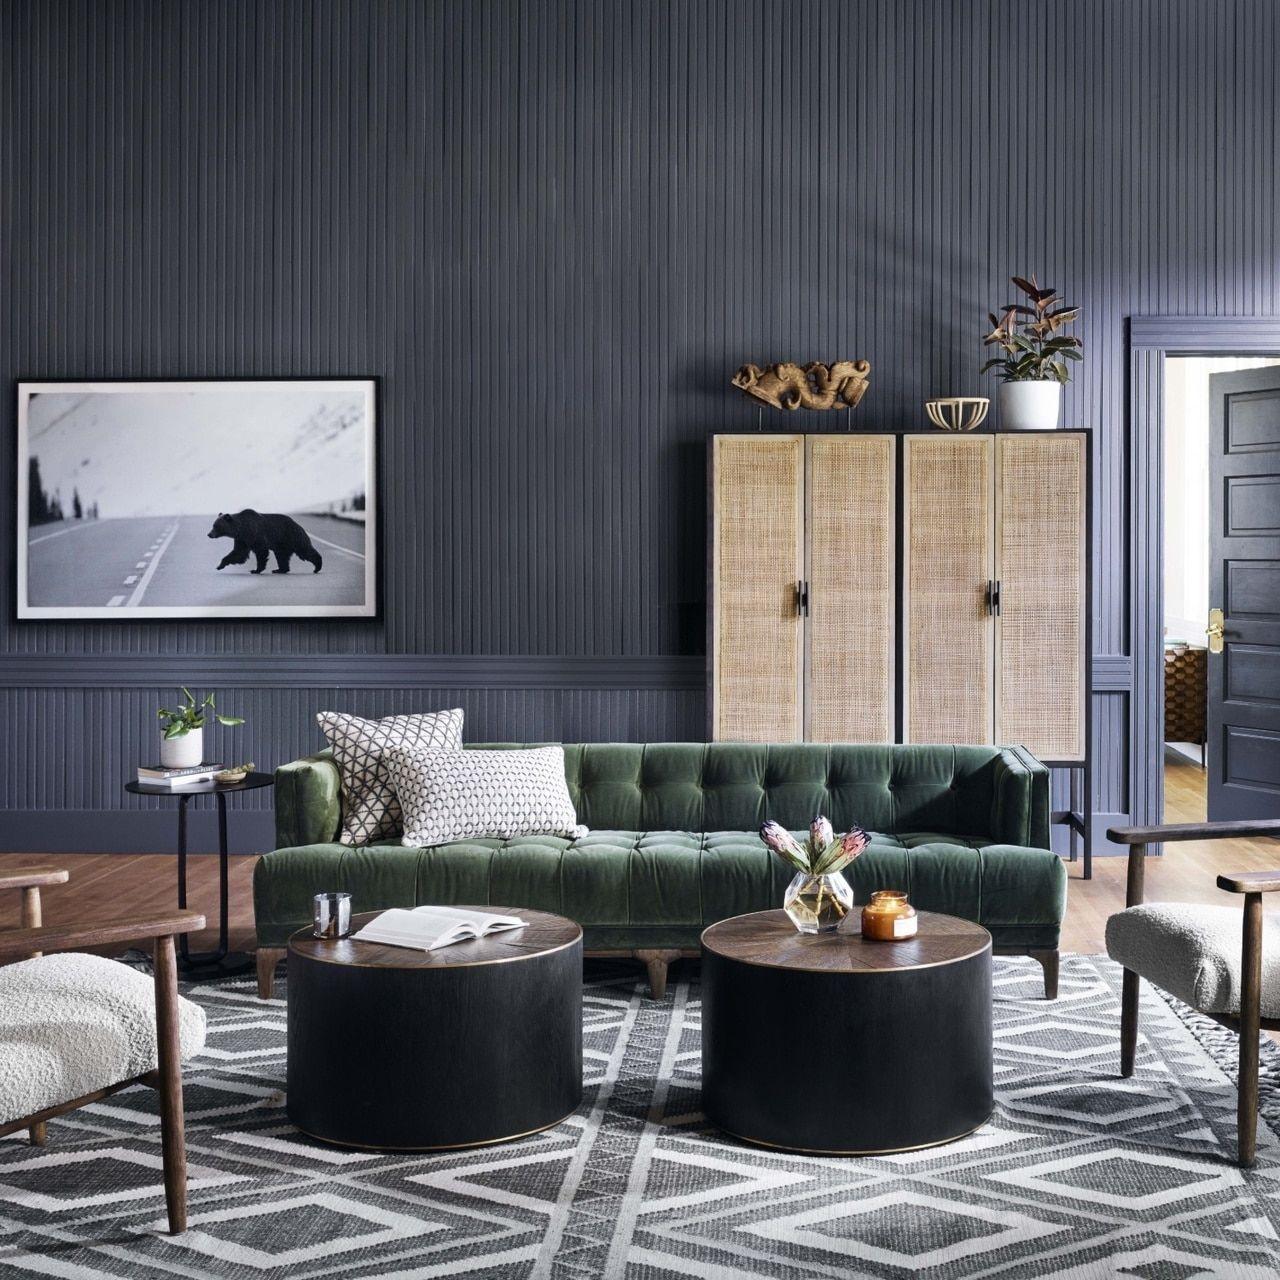 Dylan Mid Century Modern Olive Green Velvet Tufted Sofa In 2020 Mid Century Lounge Chairs Velvet Tufted Sofa Velvet Lounge Chair #redding #gray #living #room #collection